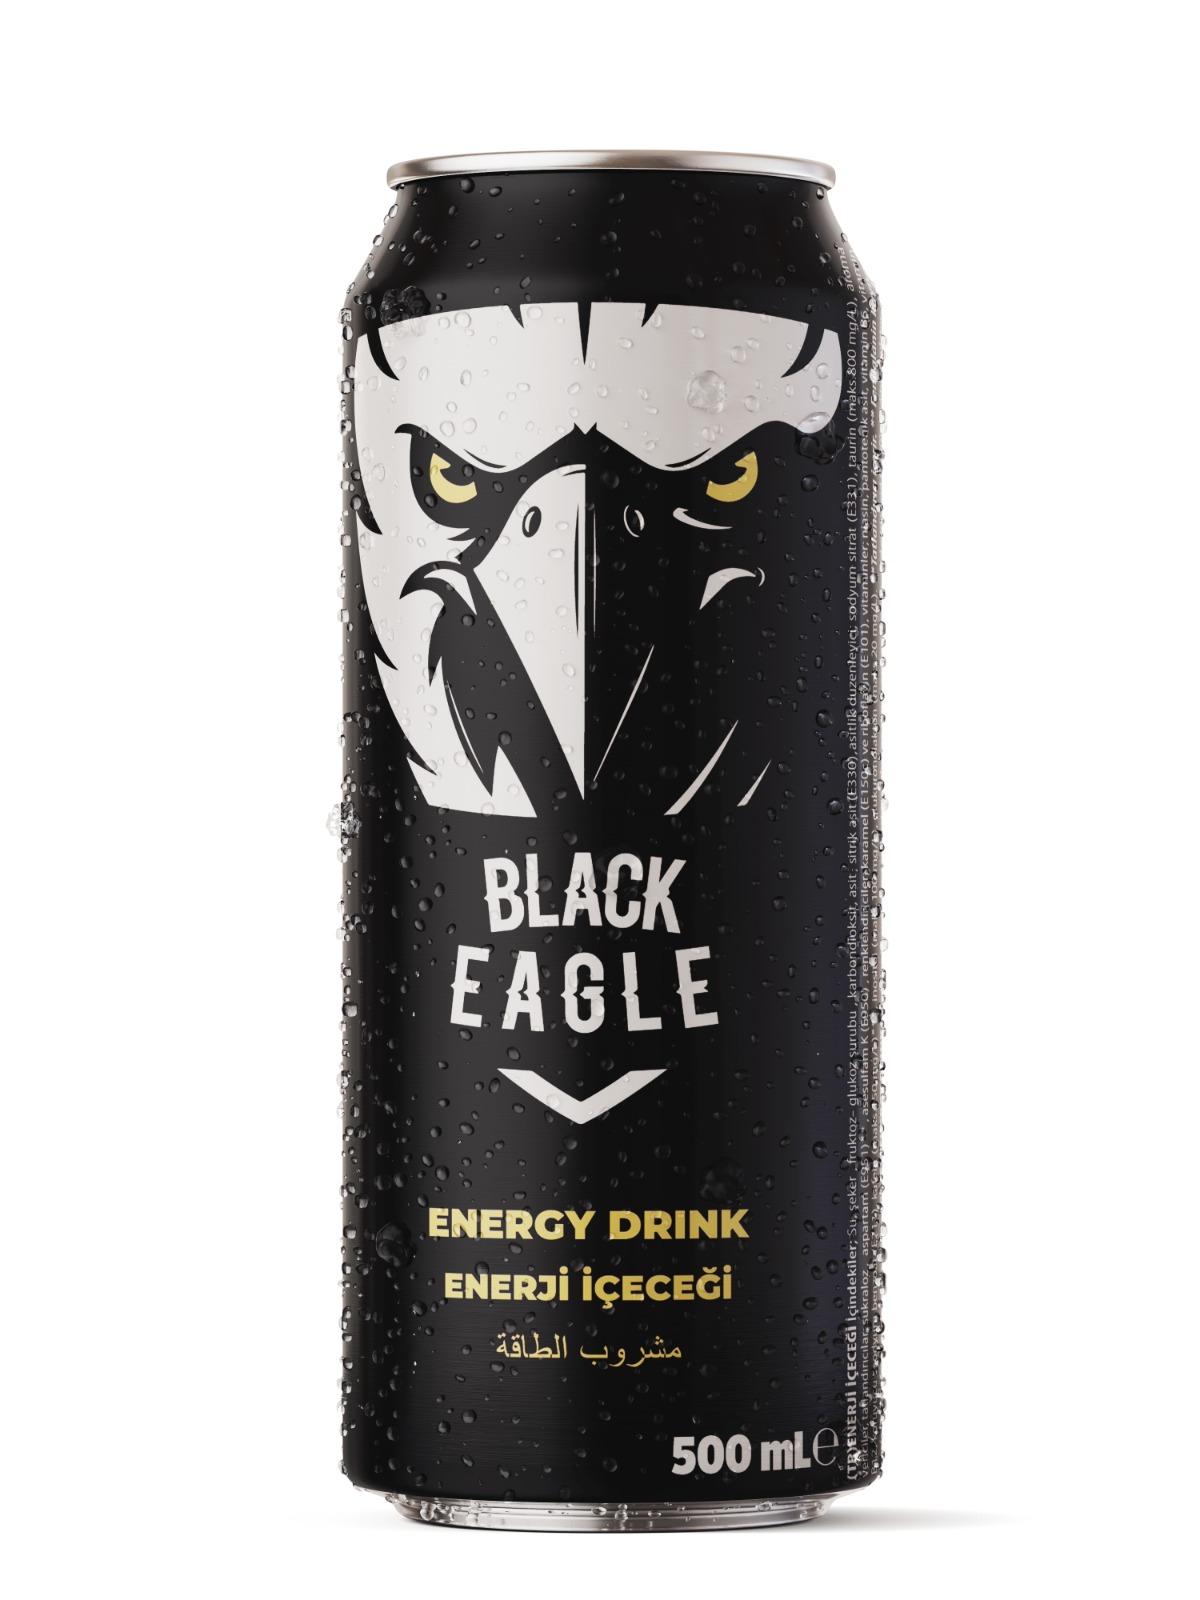 Energy Drink Black Eagle